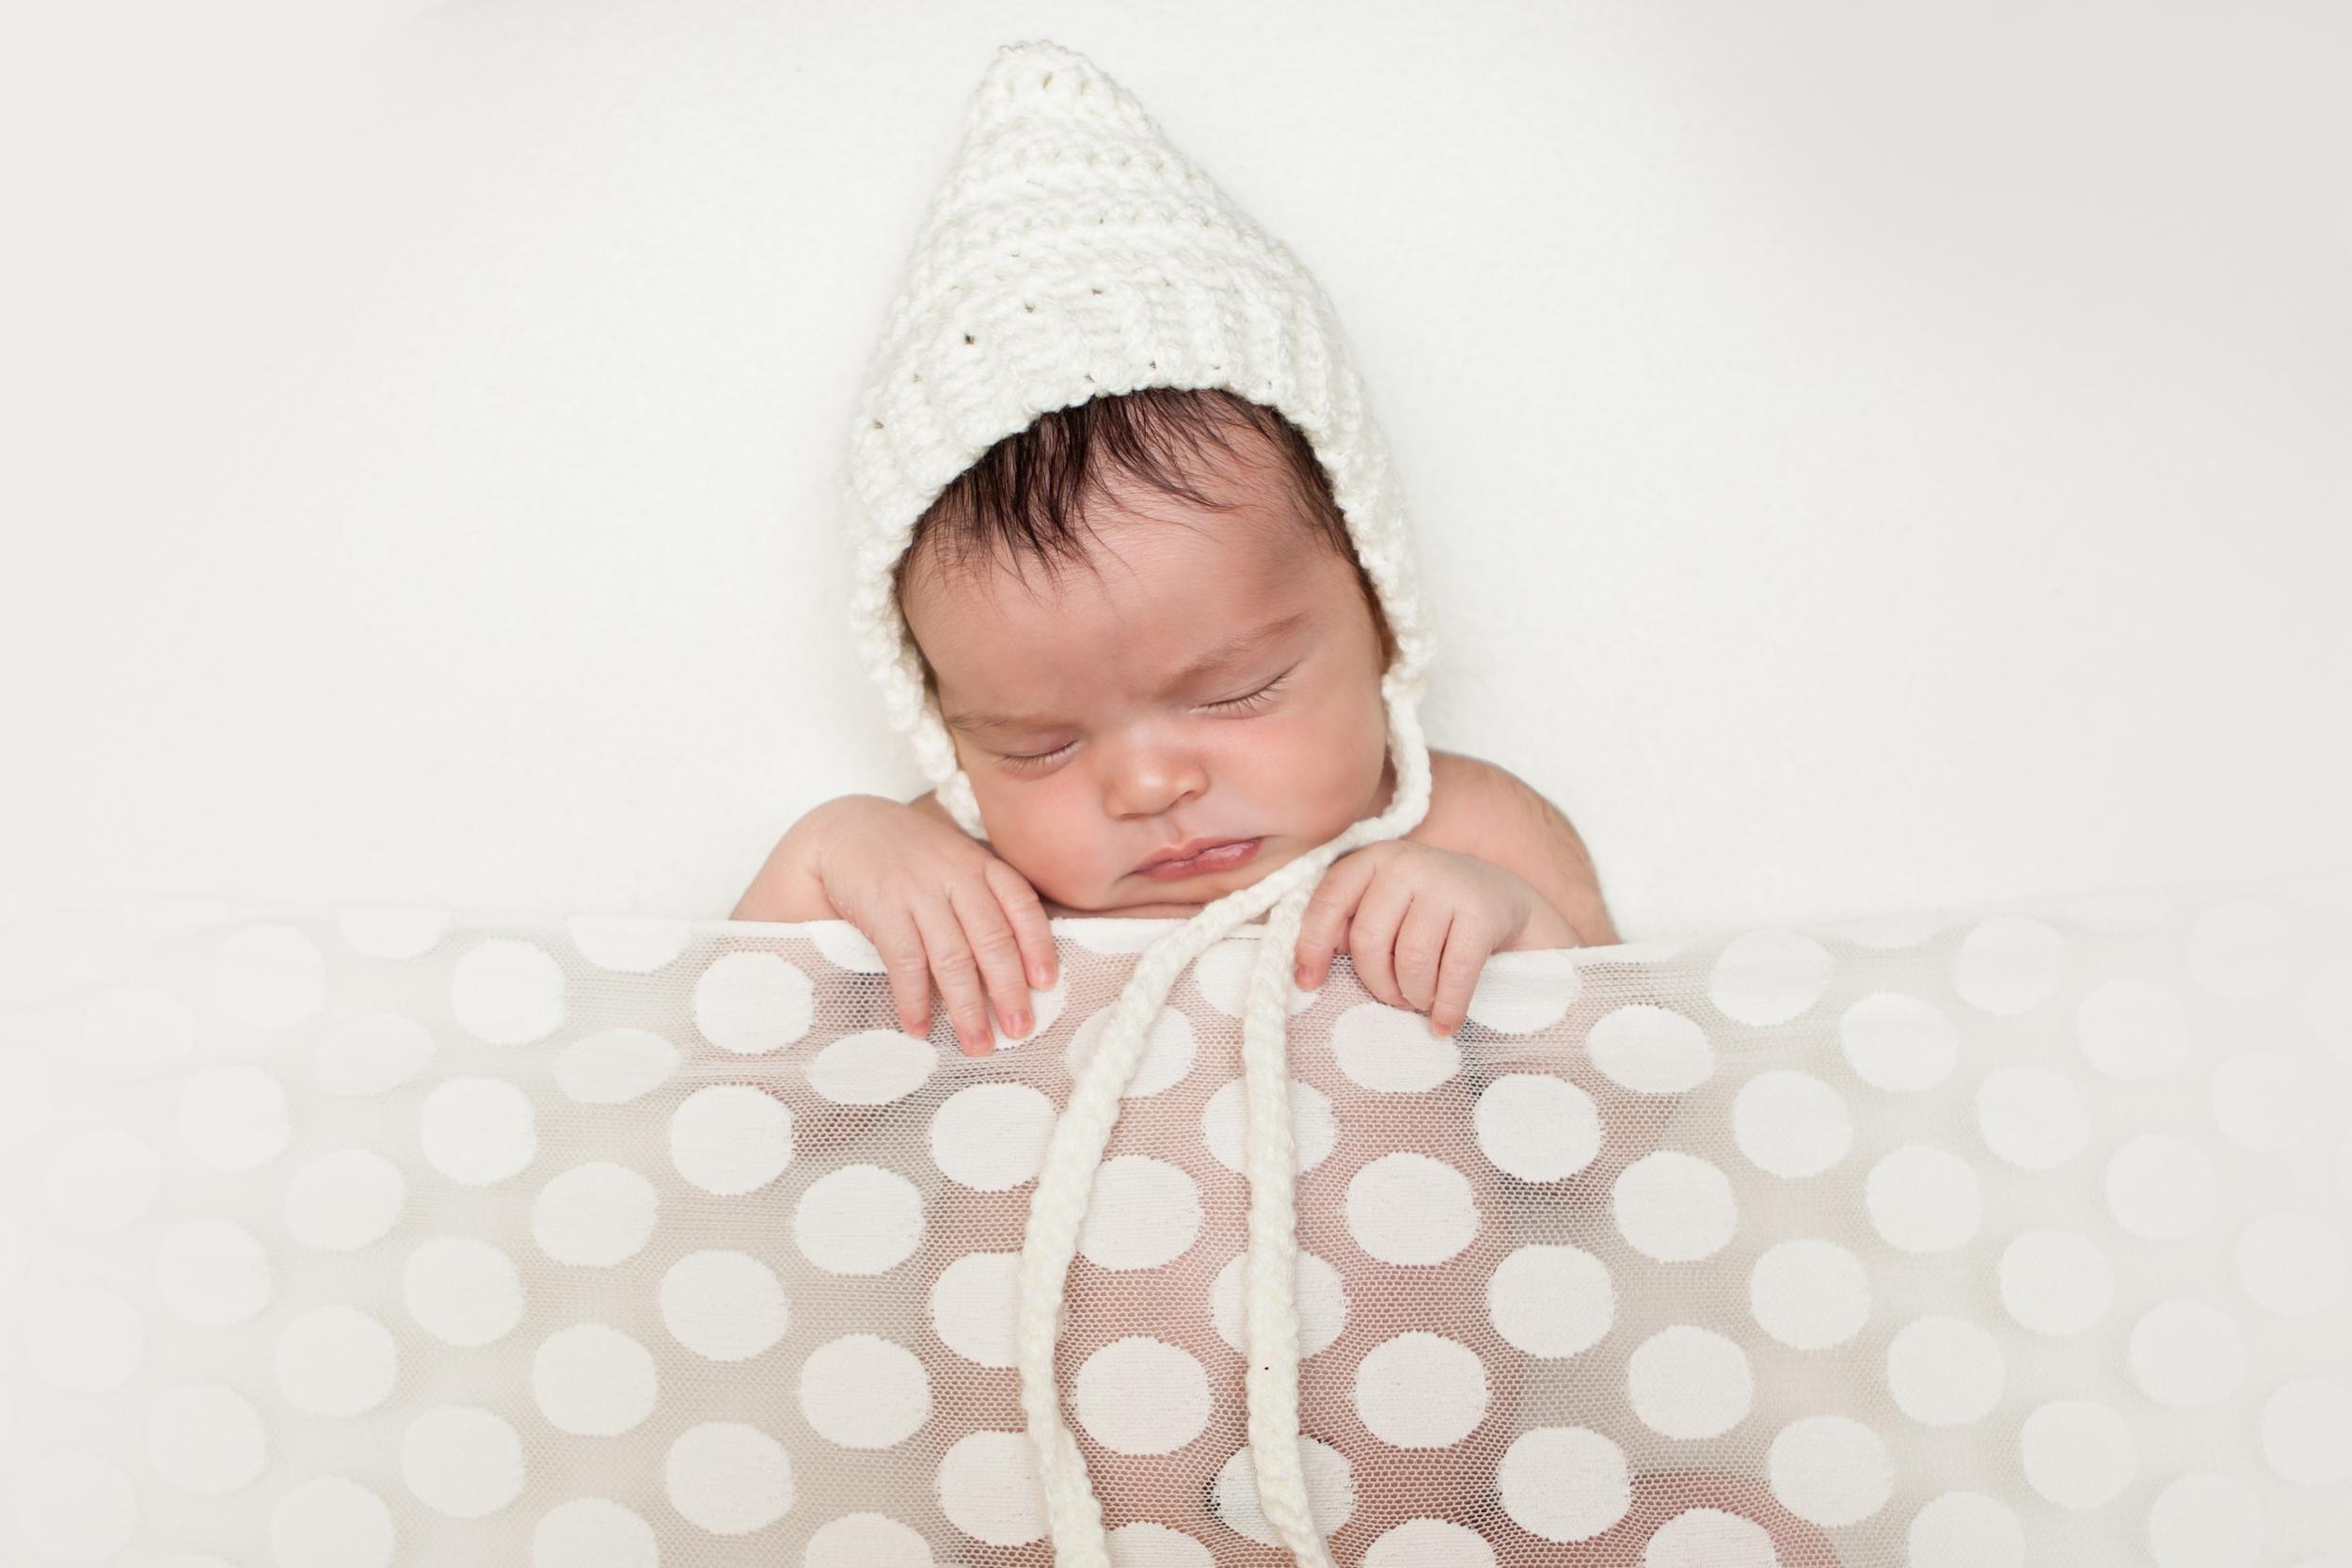 Newborn baby girl white blanket tucked in creme bonnet, Westchester County, NY Newborn Photographer Amanda Noelle Photography.